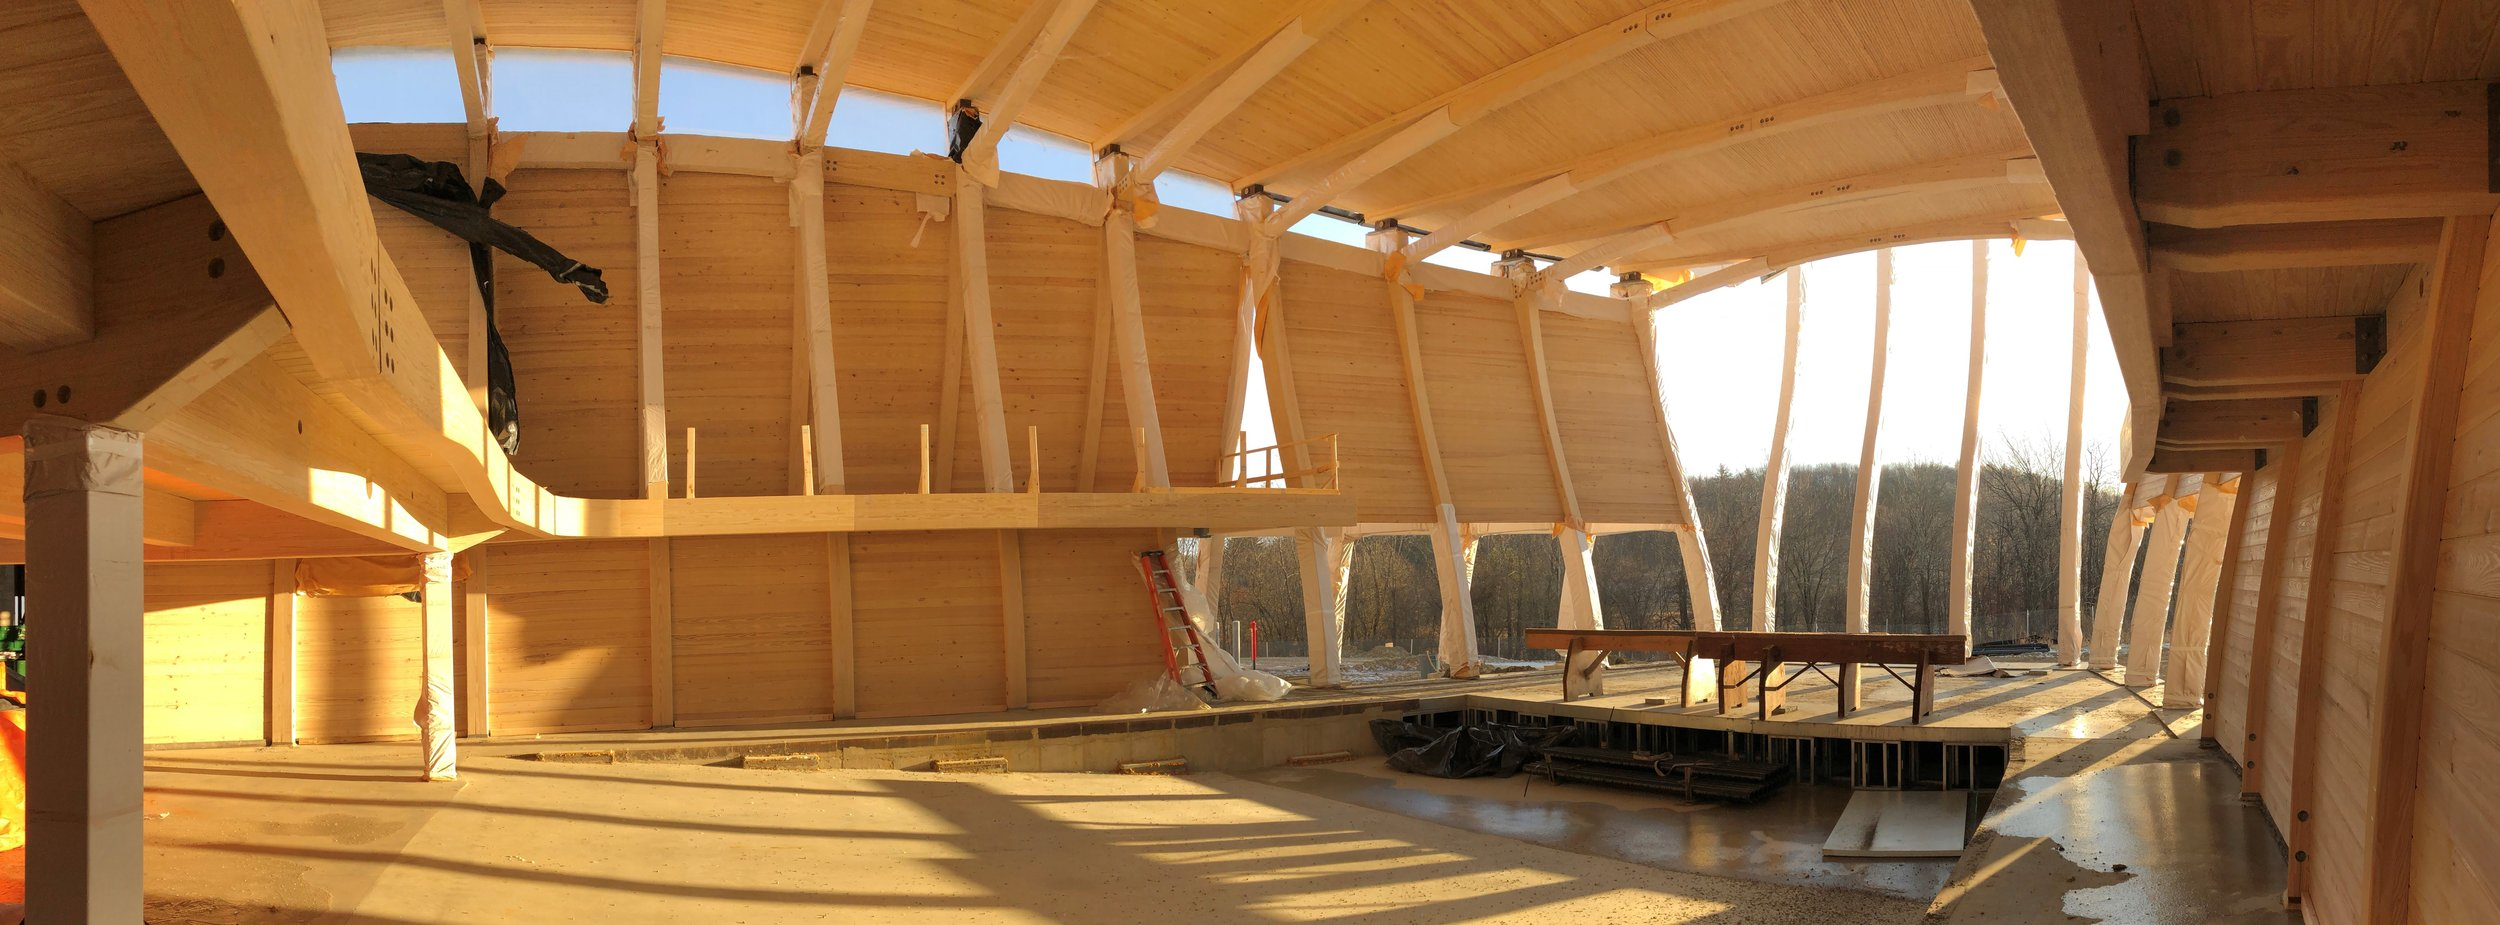 Indian Hill Courtesy of Epstein Joslin Interior View Construction 2019.jpg